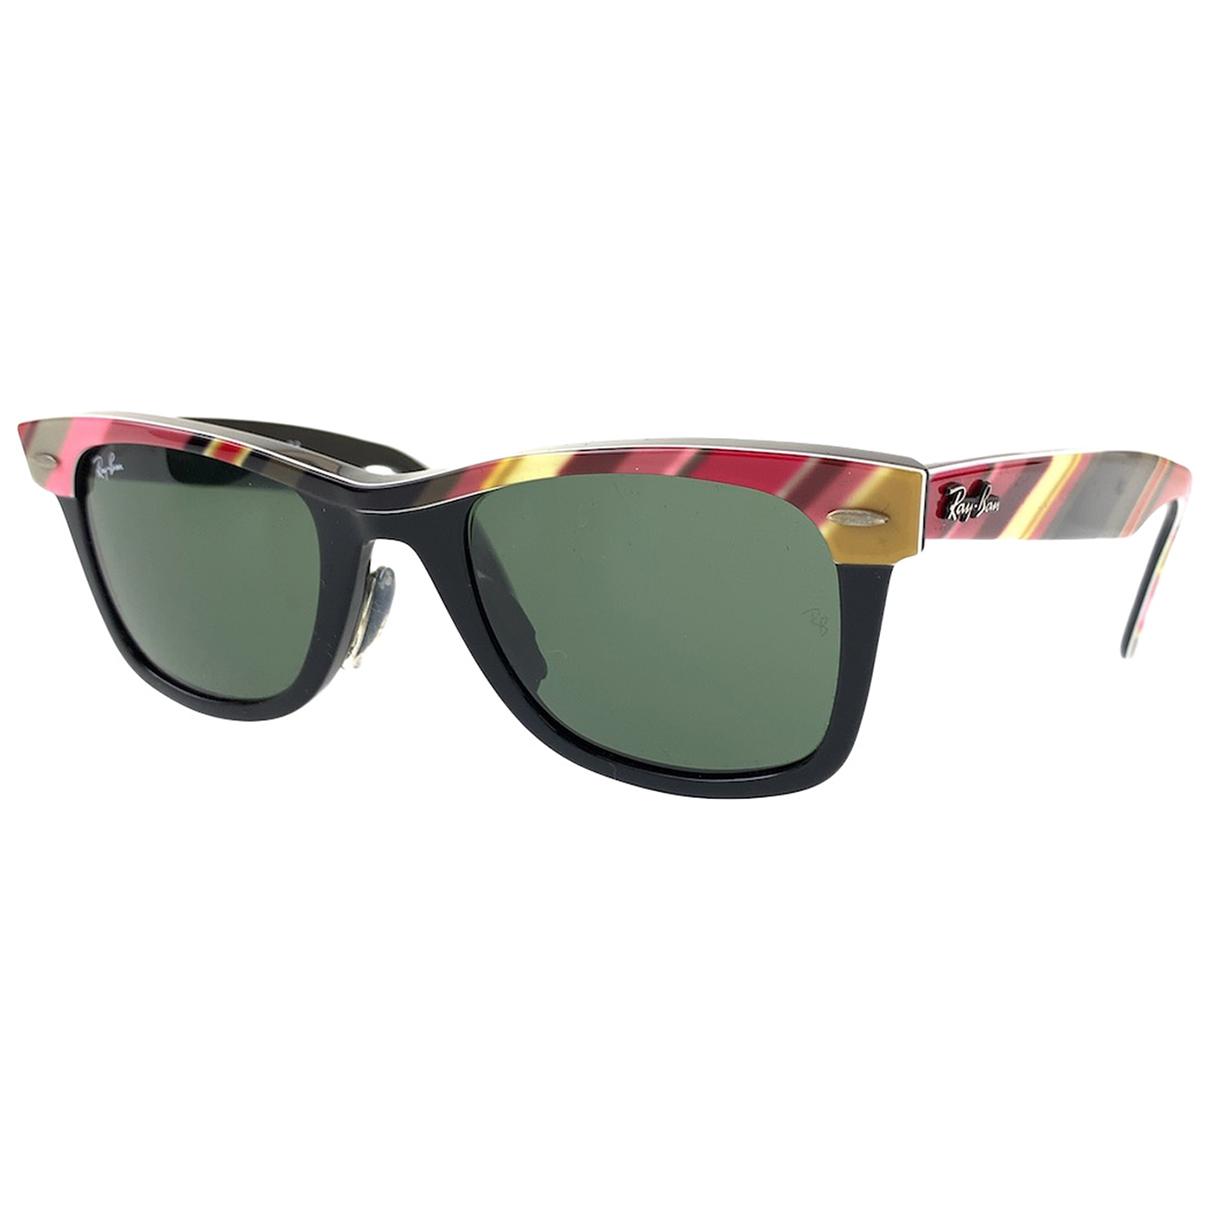 Ray-ban N Sunglasses for Women N